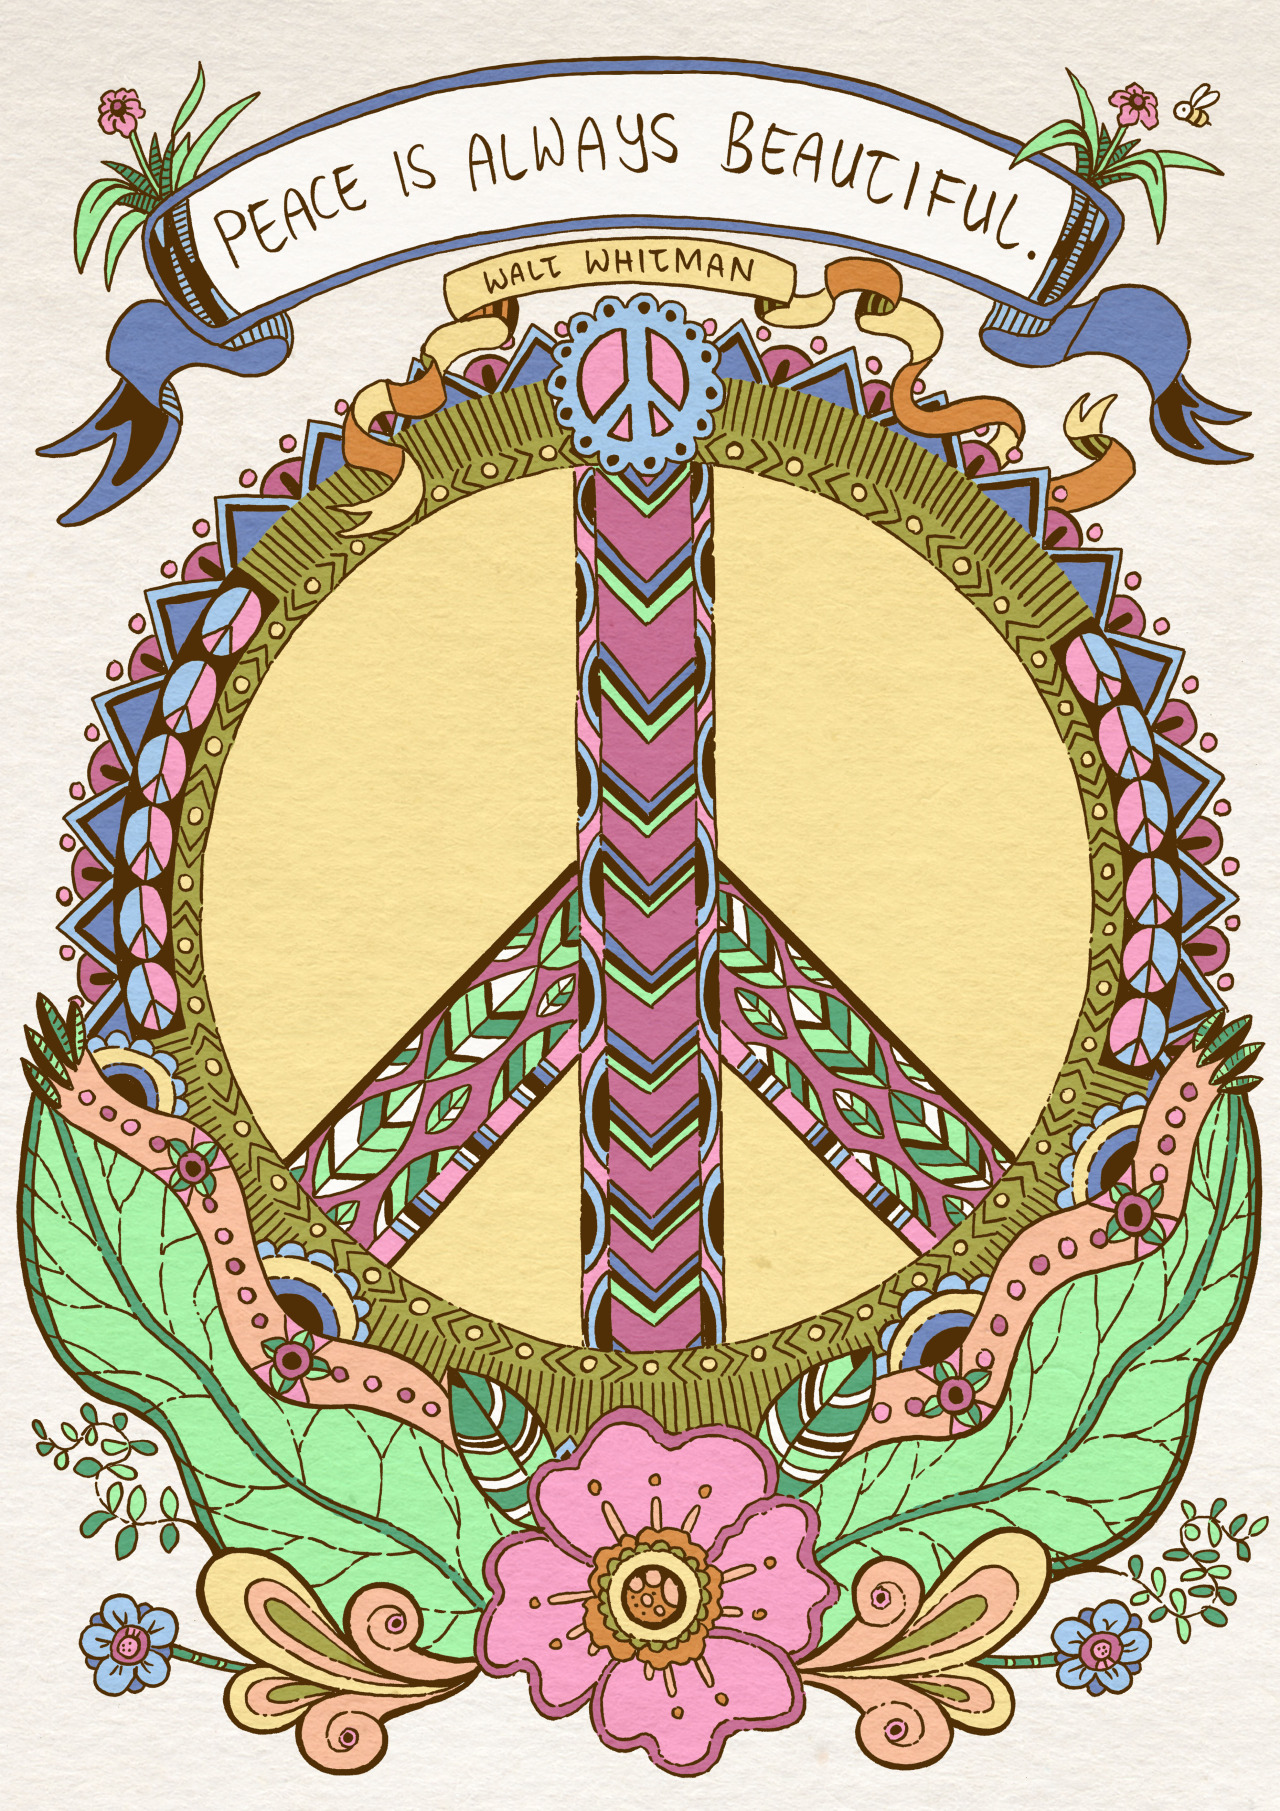 Hippie clipart beautiful heart Art ☮ Sign Peace ☮